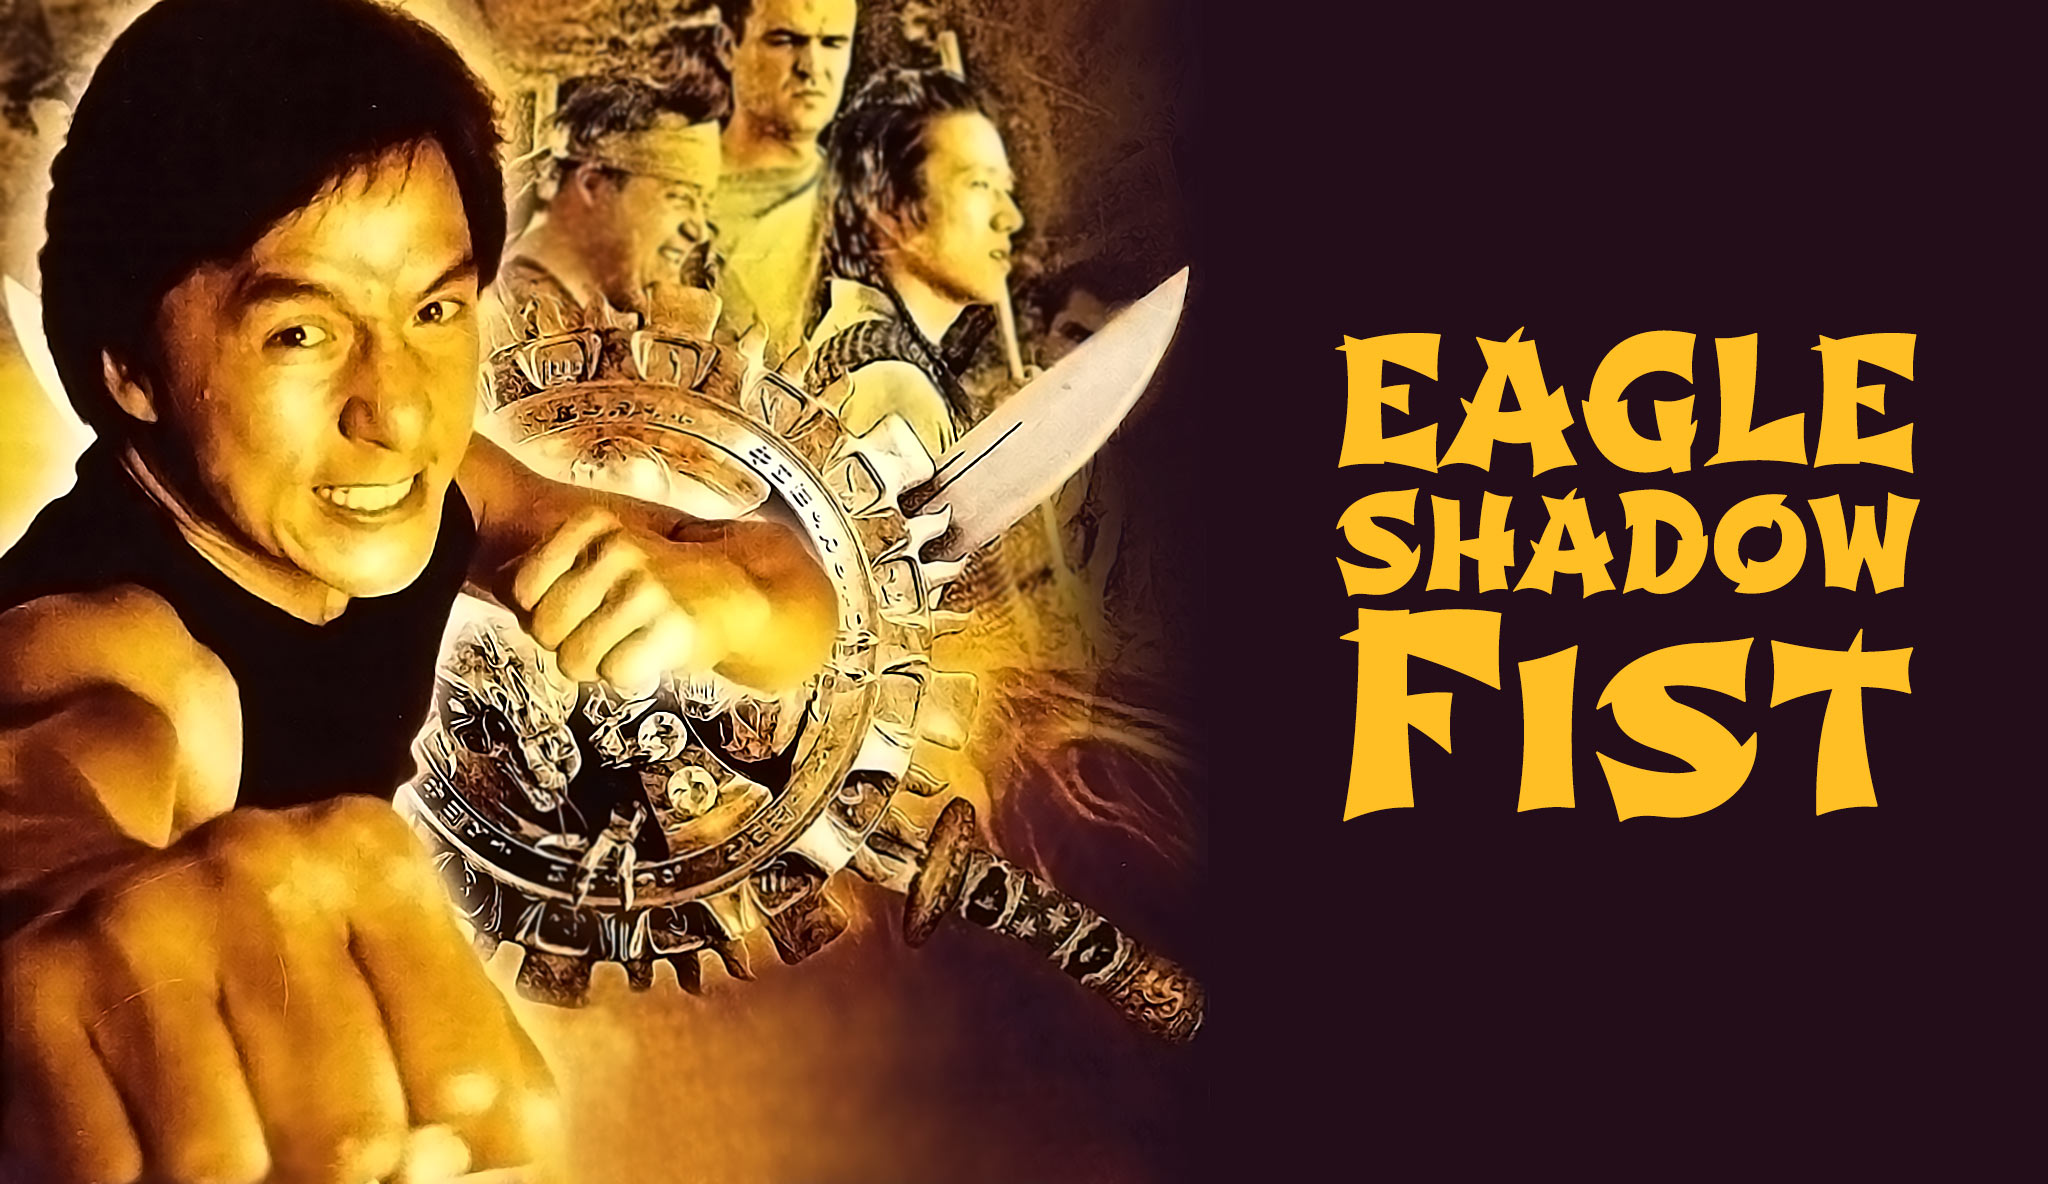 jackie-chan-eagle-shadow-fist\header.jpg